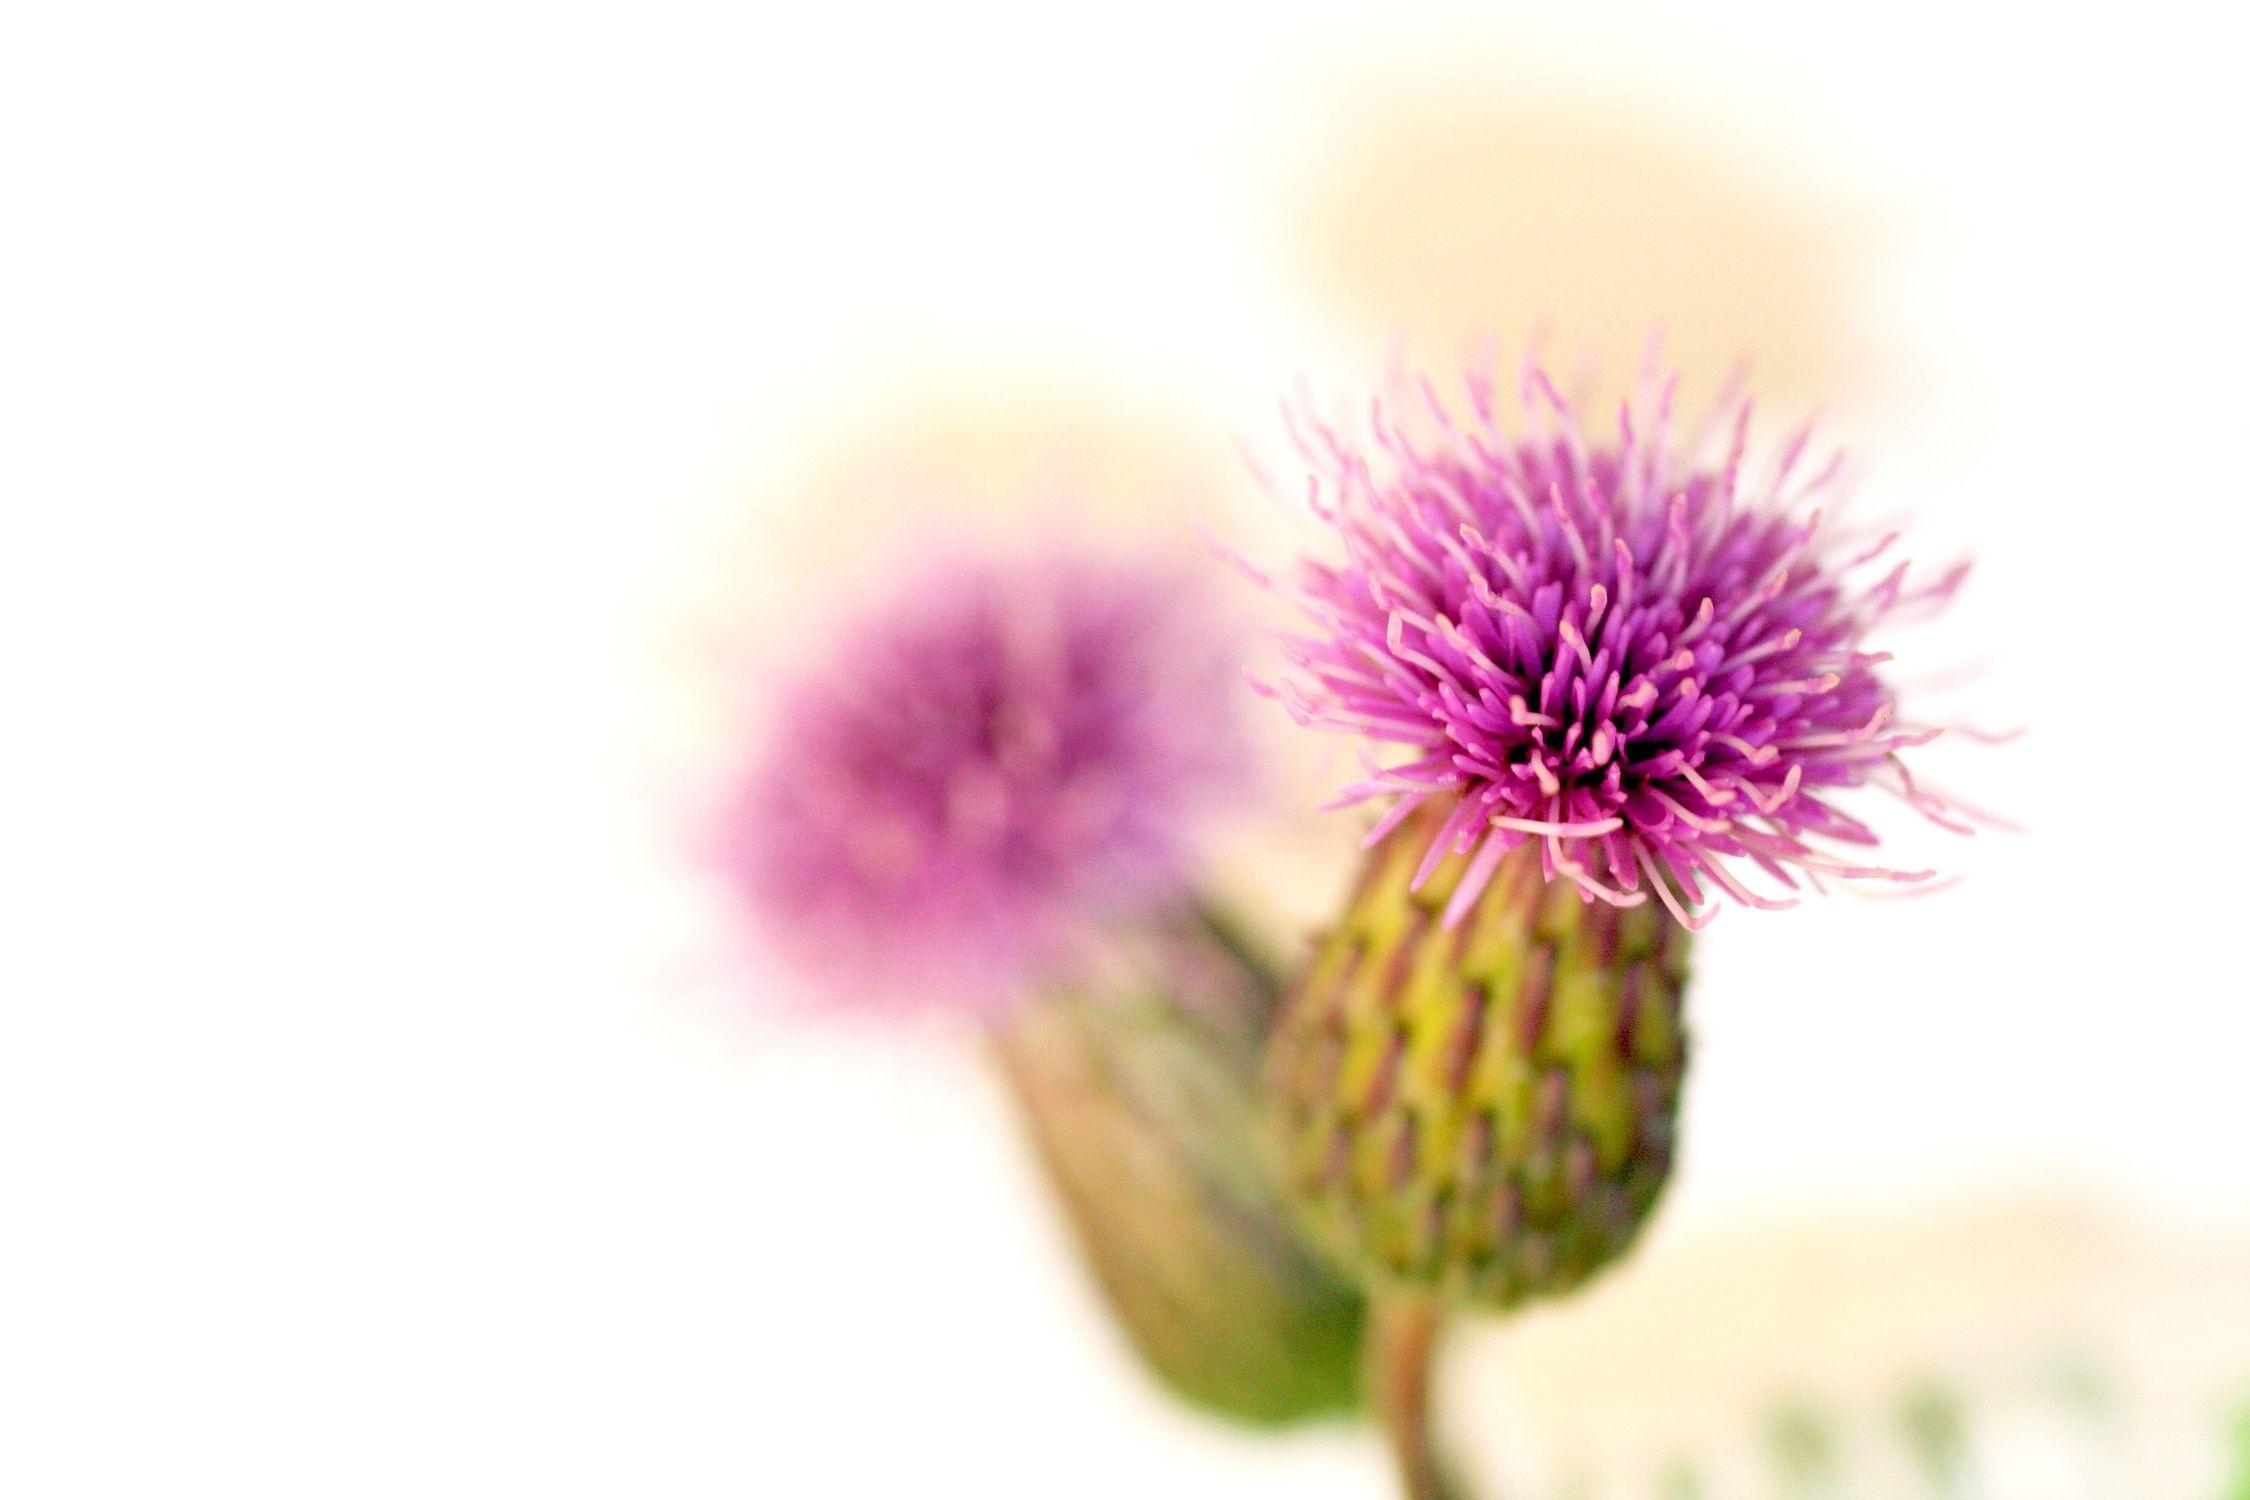 Bild mit Farben, Natur, Pflanzen, Blumen, Rosa, Lila, Korbblütler, Disteln